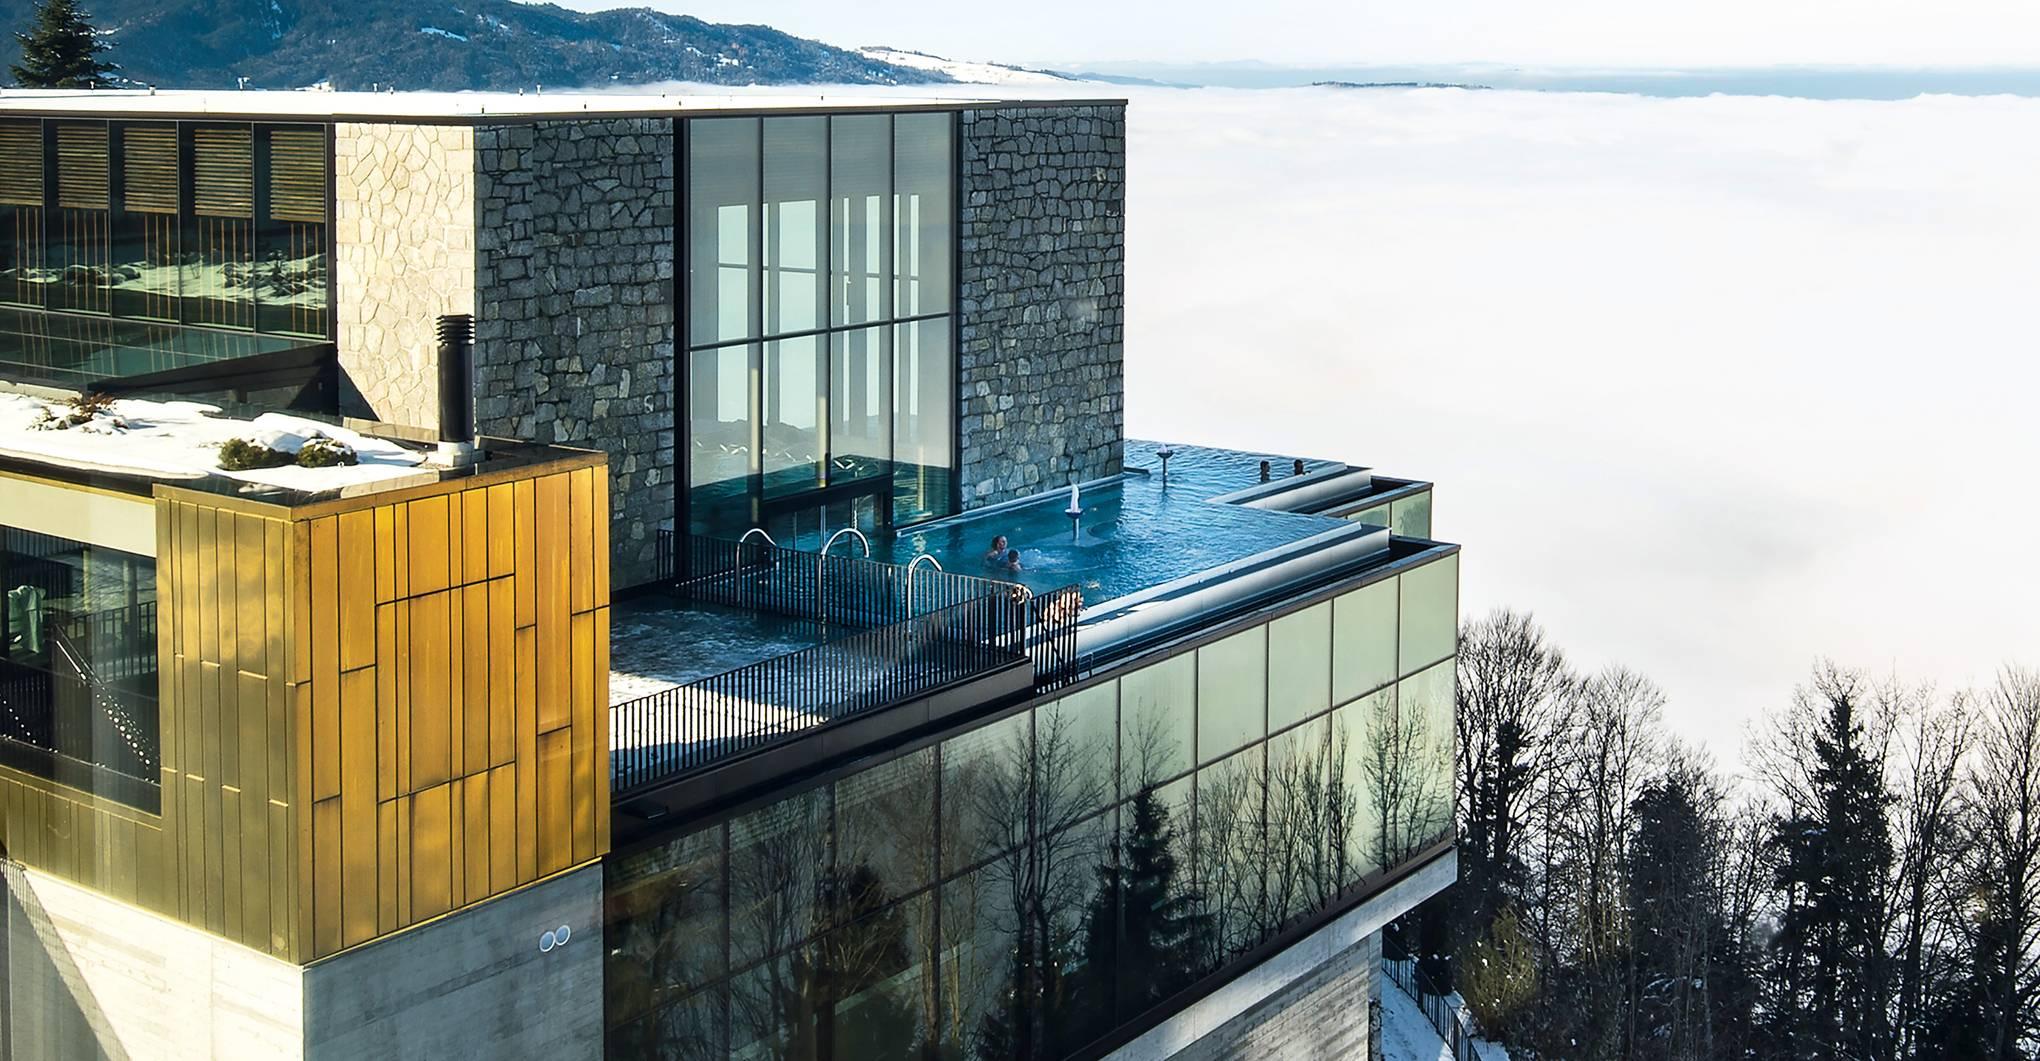 Burgenstock, Switzerland